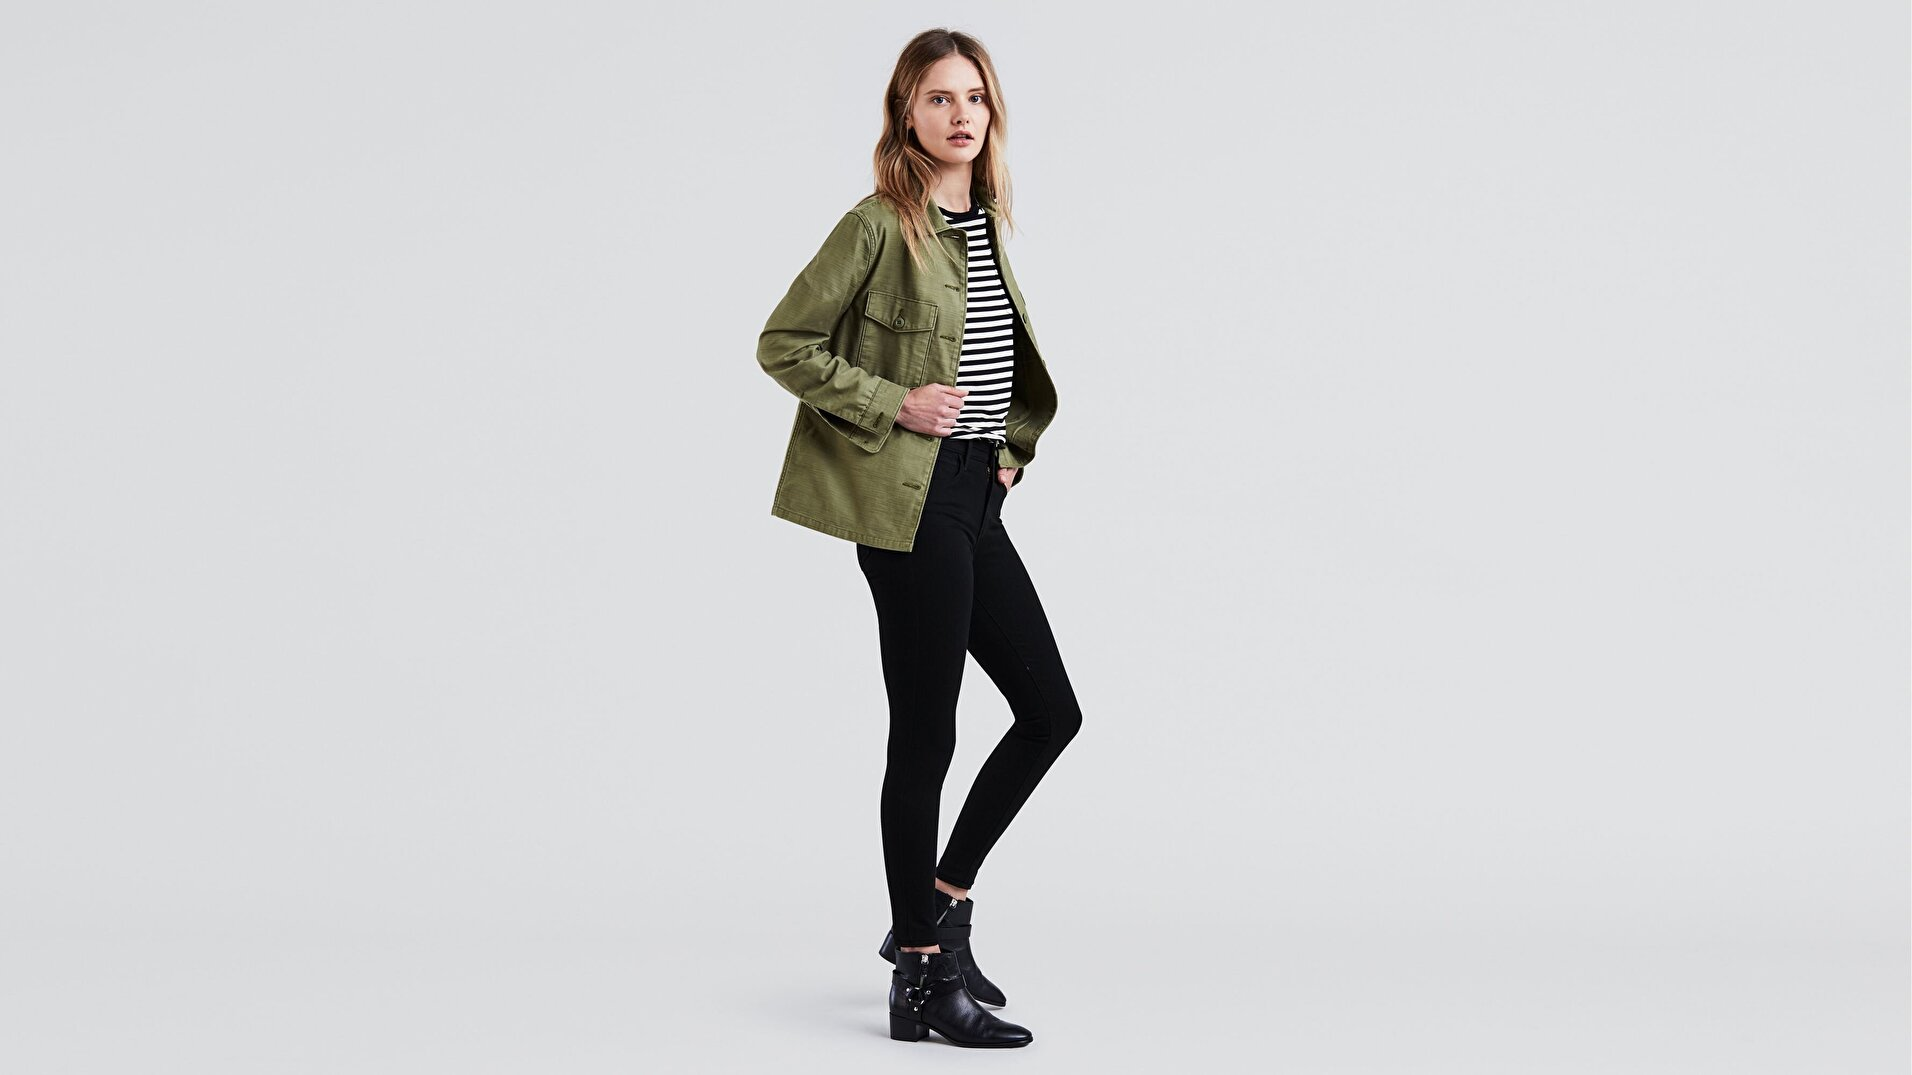 720 Yüksek Bel Süper Skinny Kadın Jean Pantolon- Galaxy